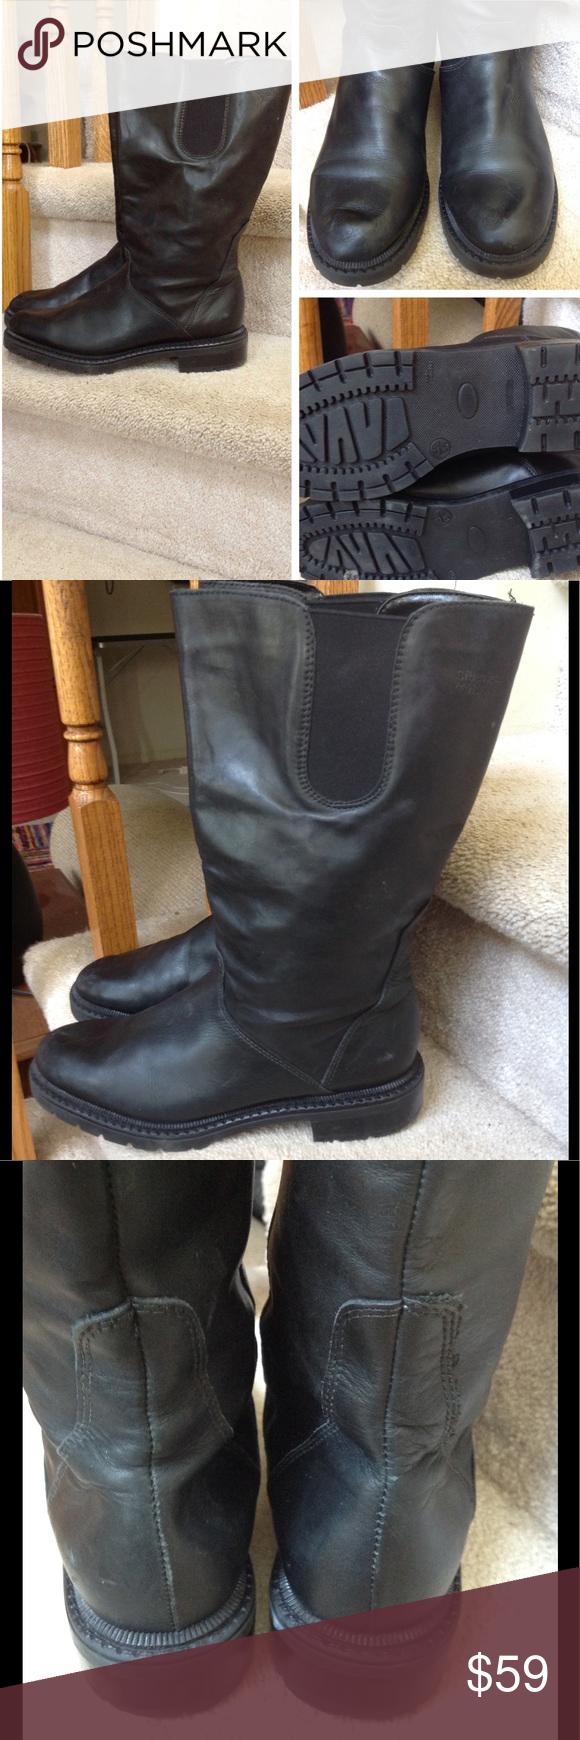 9d488b8ec636 Siberian Husky Canada black leather boots. 9.5 Ladies mid calf black leather  Siberian Husky brand